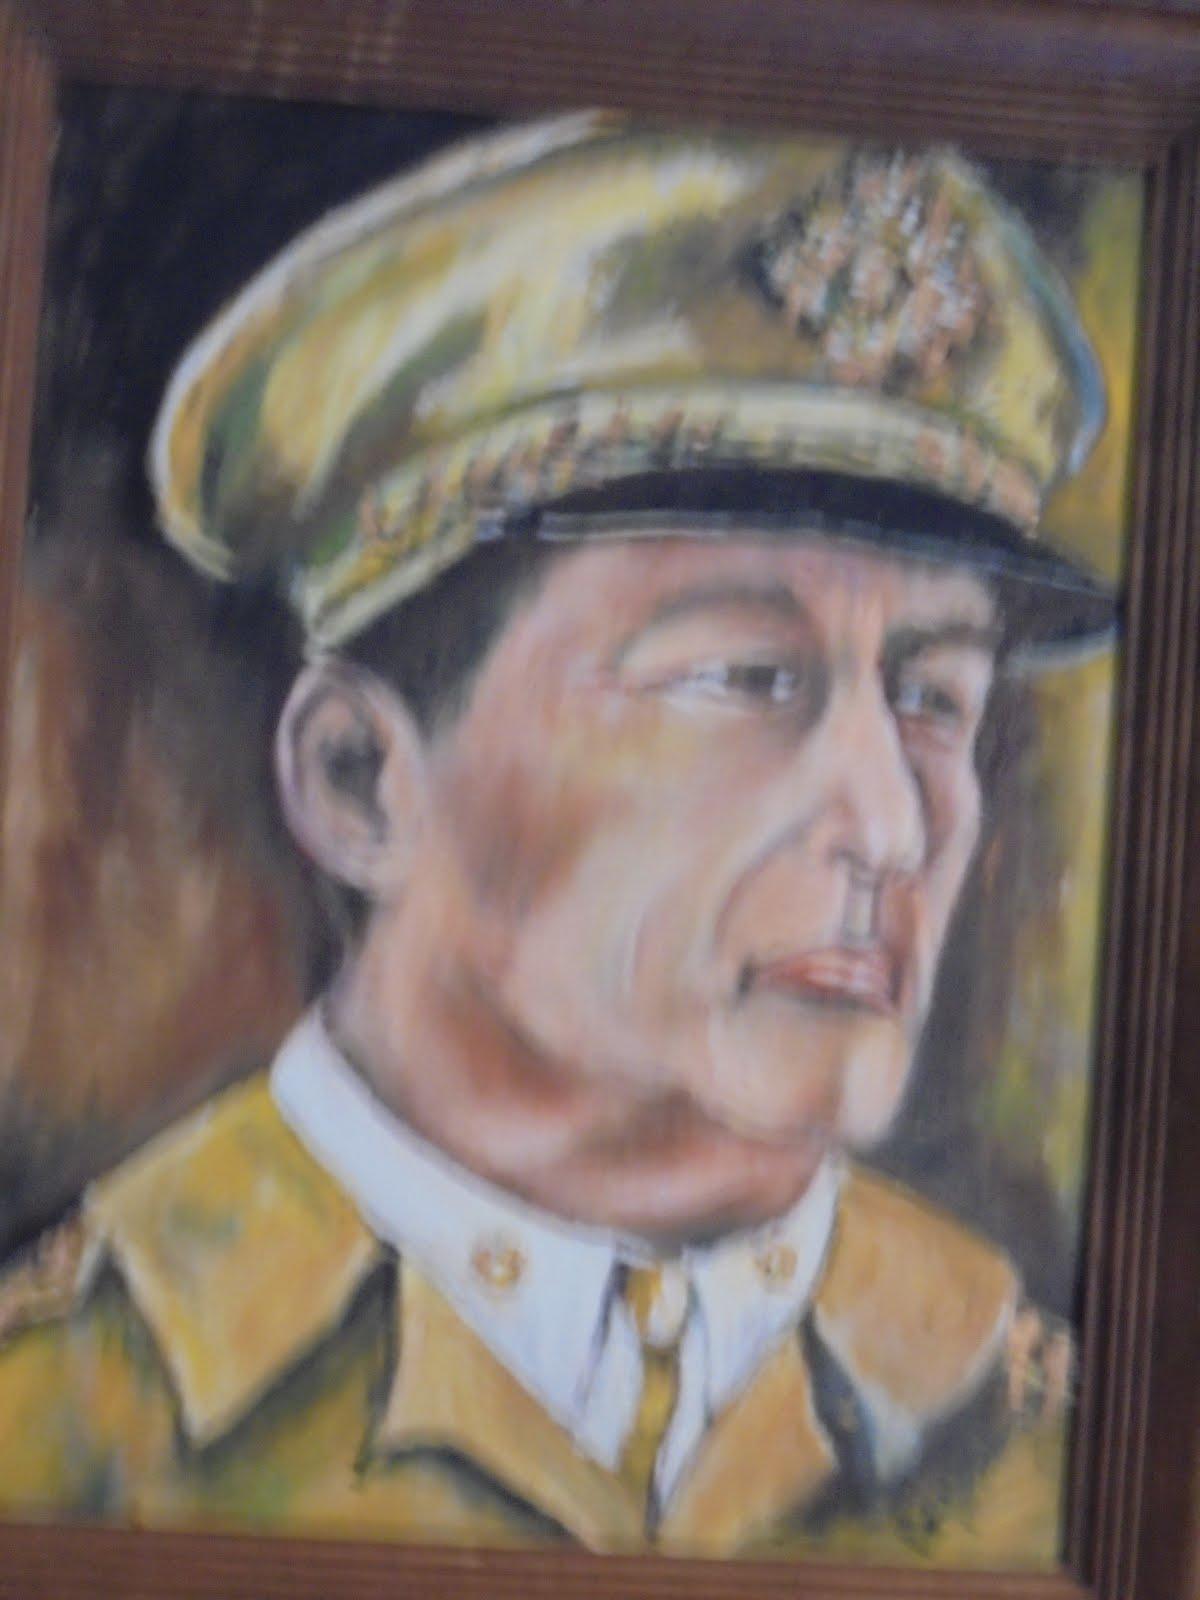 Gen.l Douglas Mac Arthur# 108